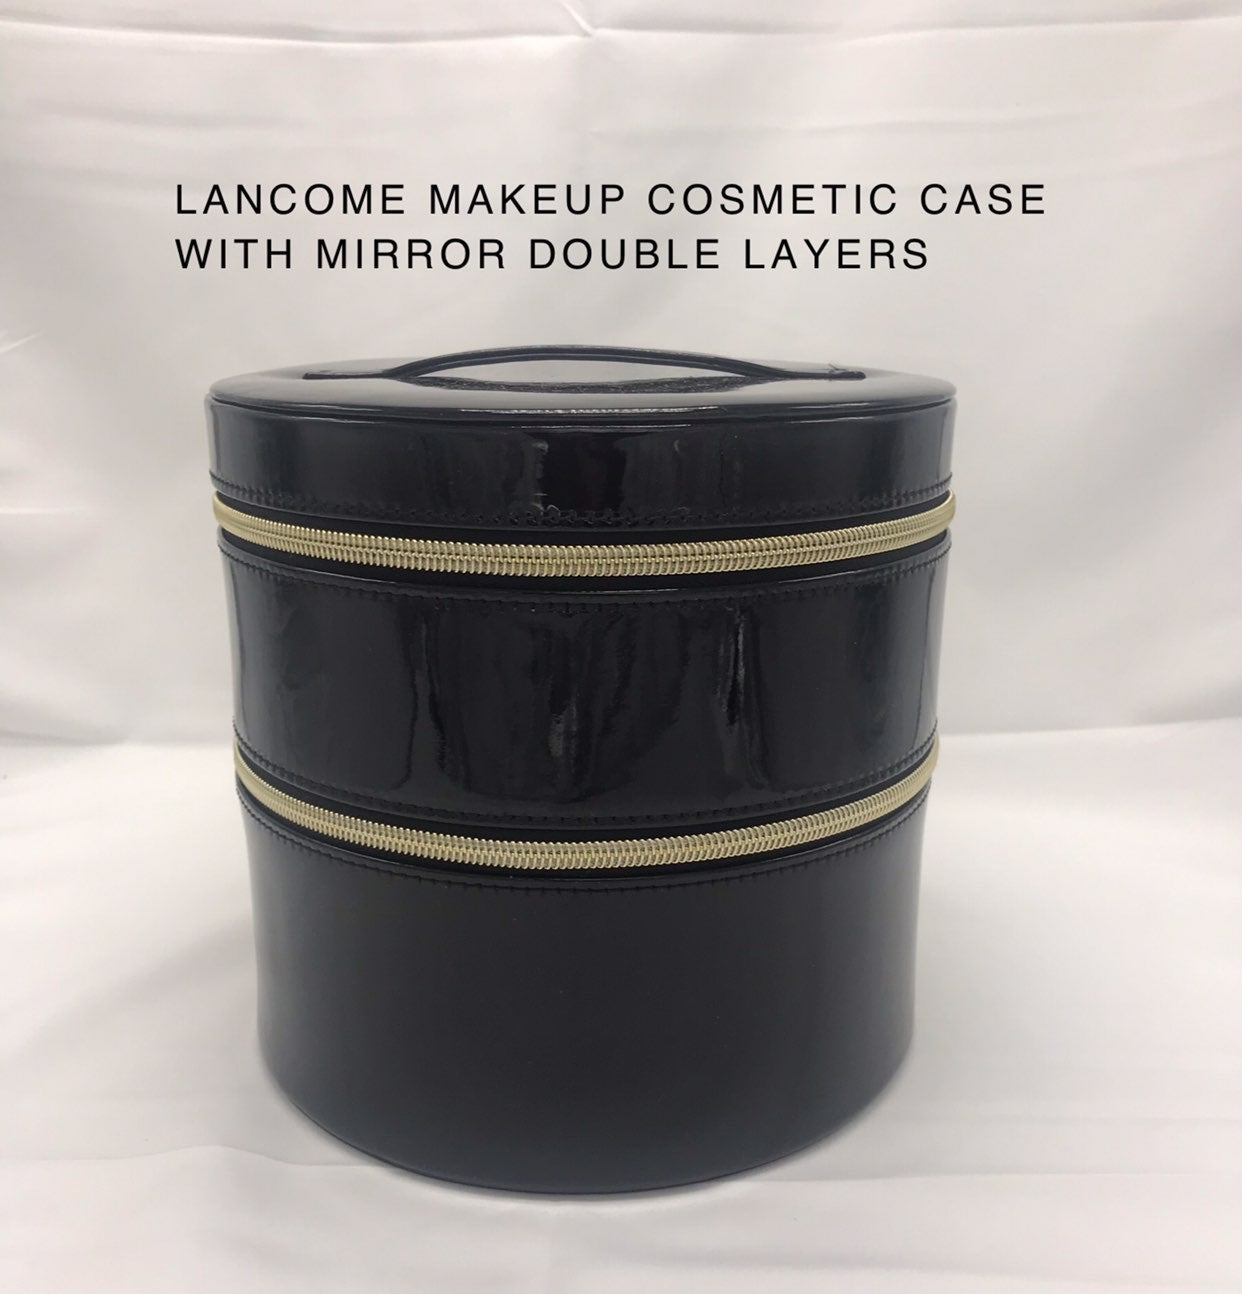 LANCOME BLACK SHINY MAKEUP COSMETIC CASE